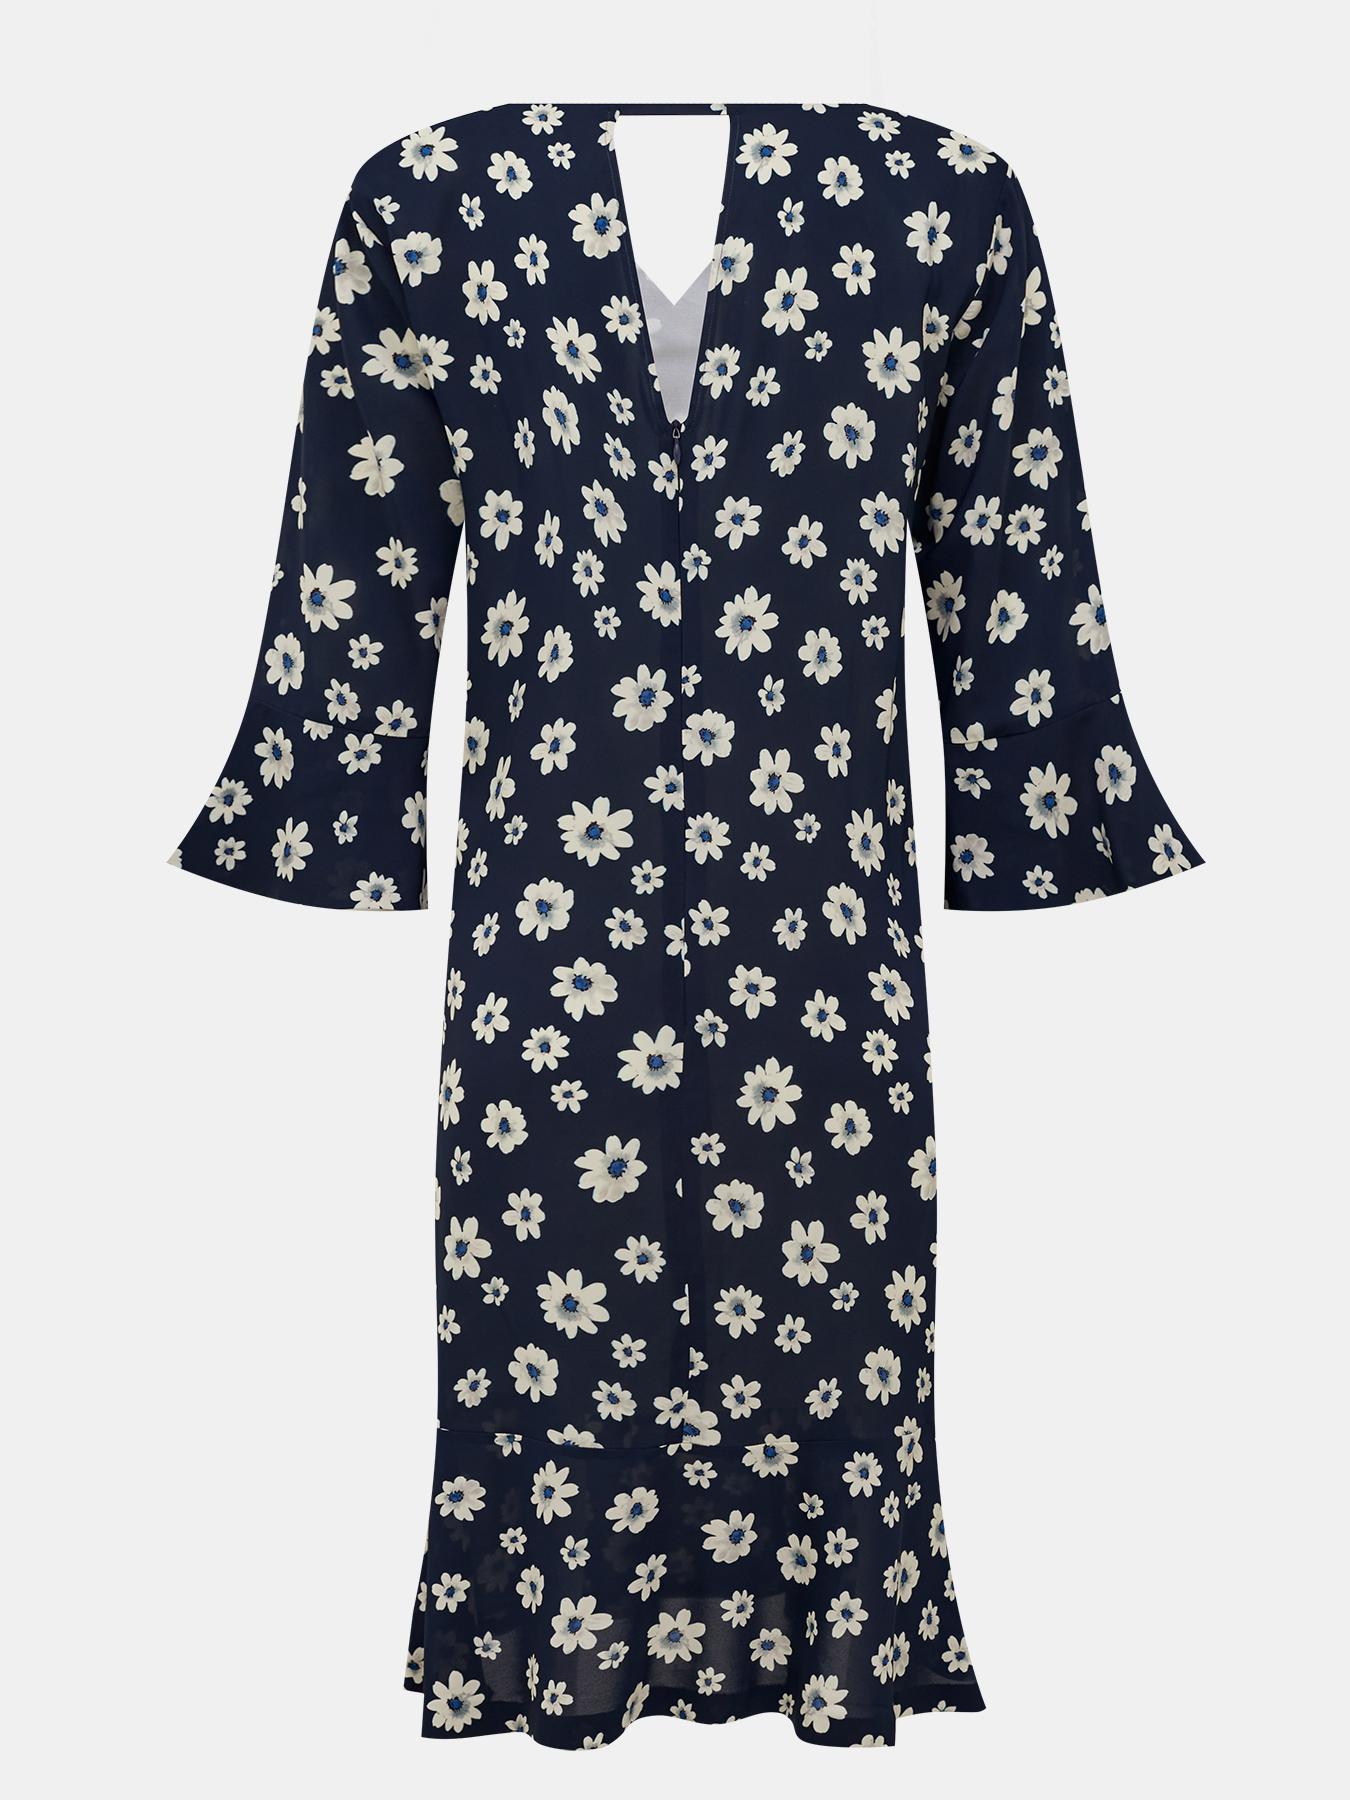 Платье Seventy Платье платье dorogobogato dorogobogato mp002xw1226q